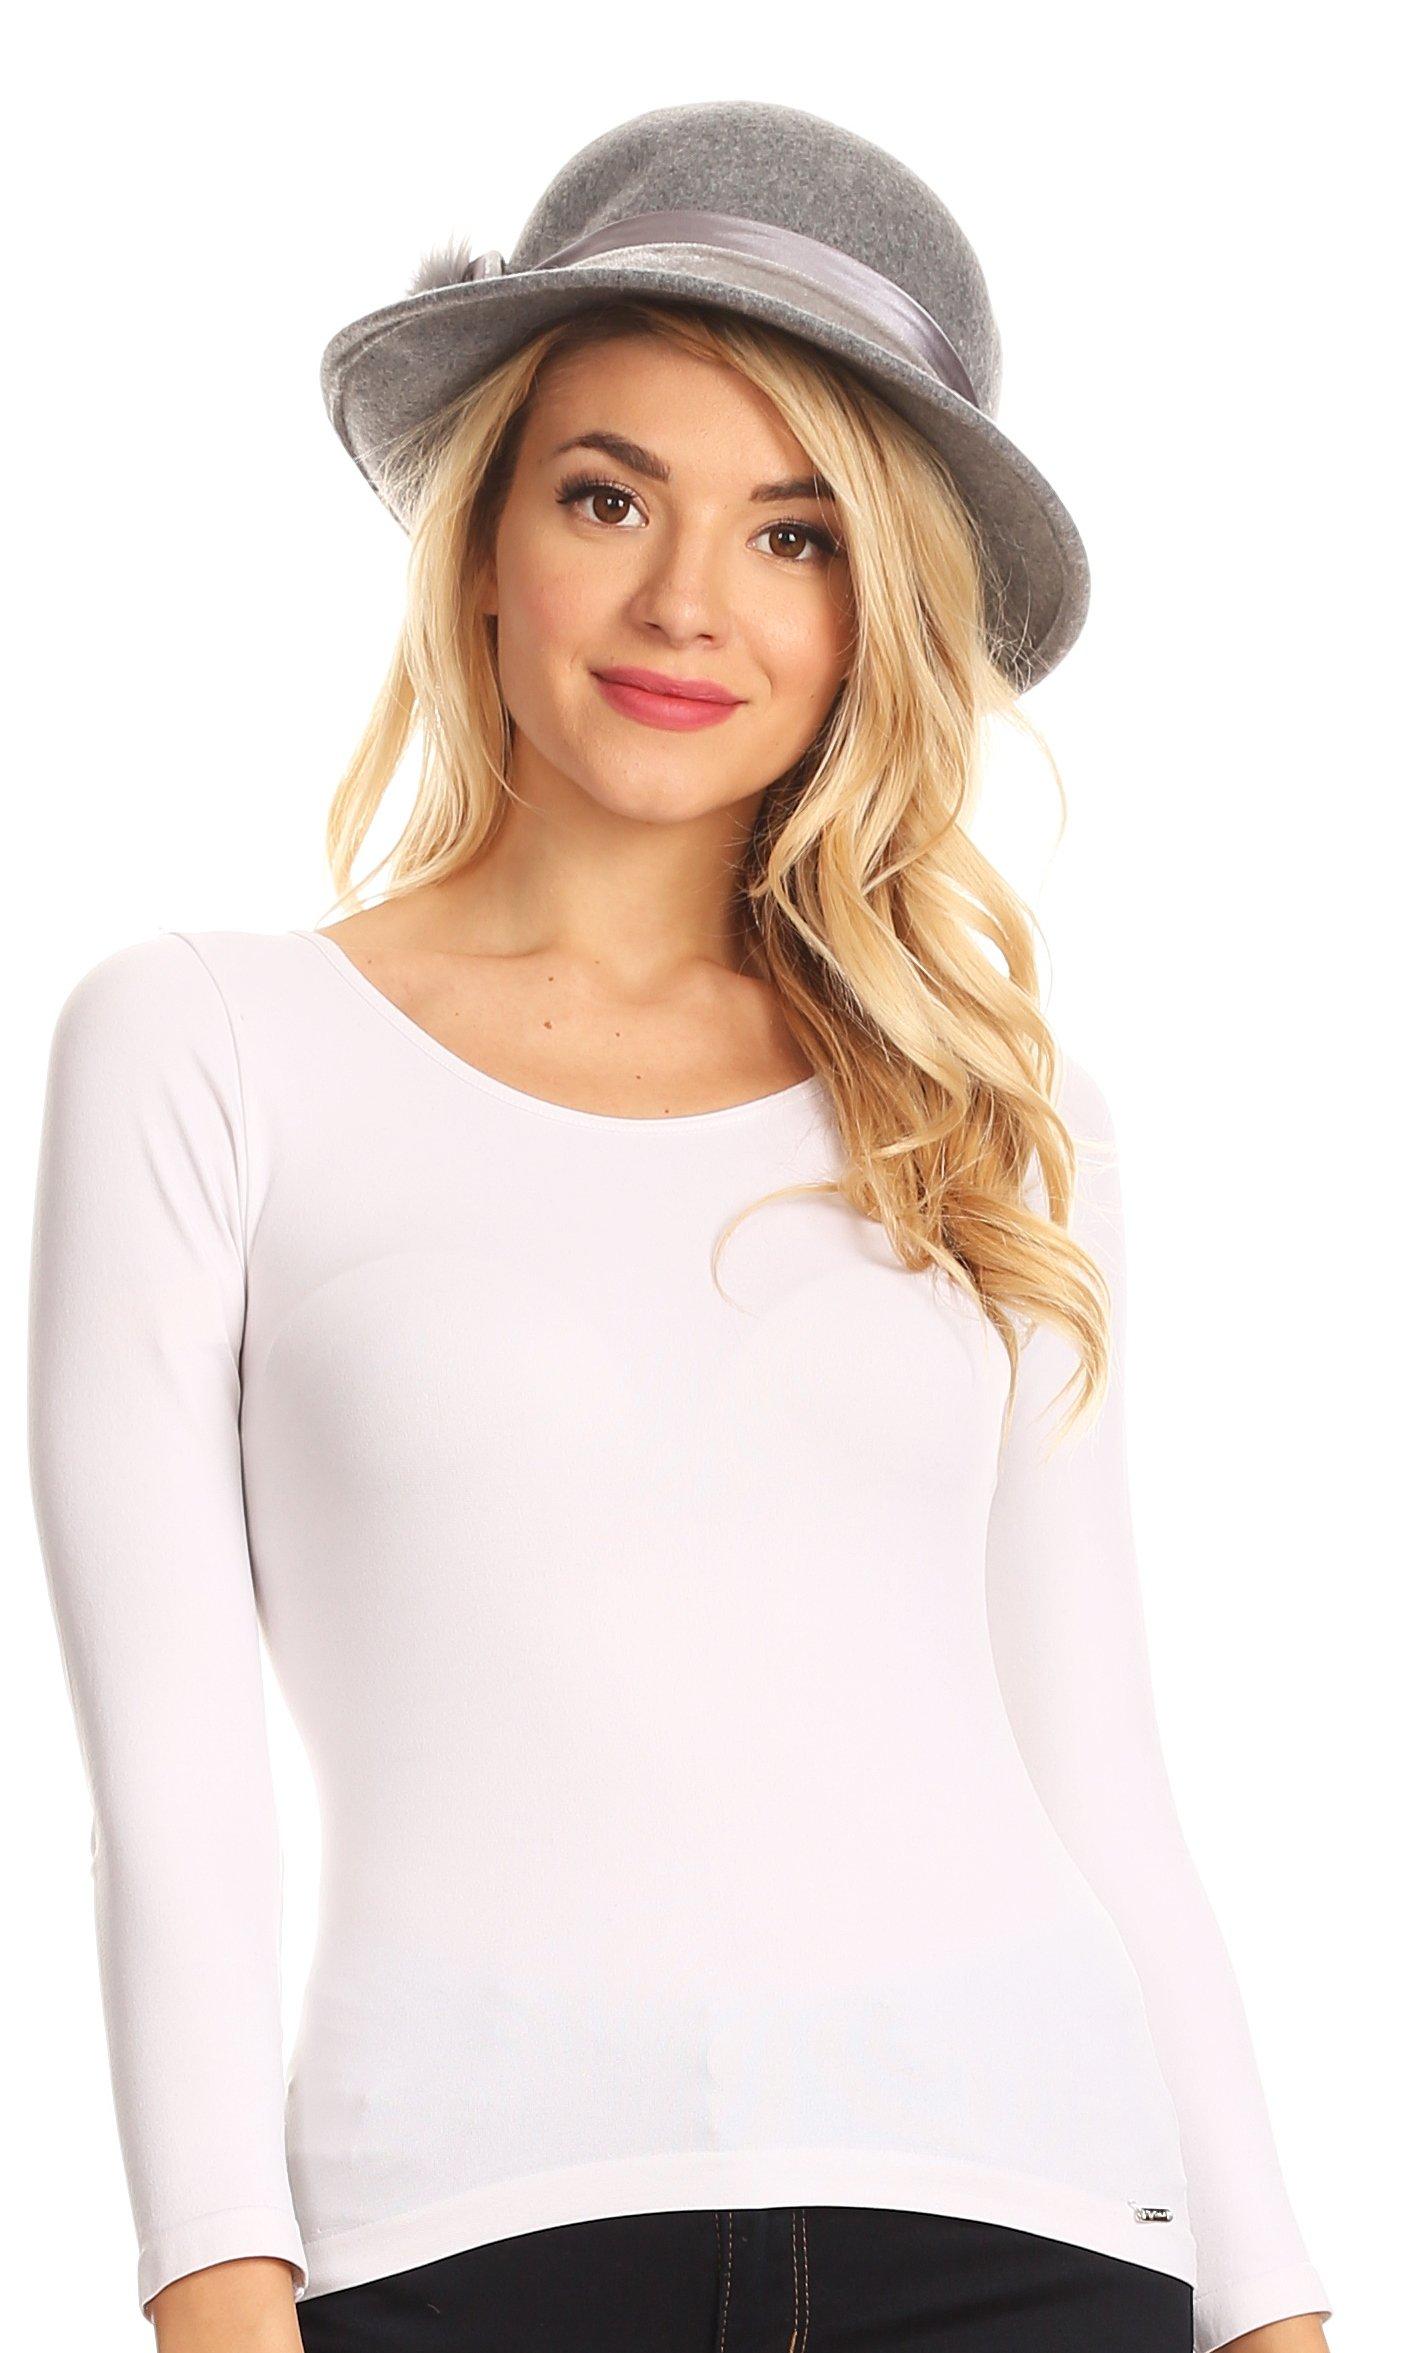 Sakkas 1798 - Tessa Wool Cloche Flapper Gatsby Hat with Satin Ribbon Adjustable - Gray - OS